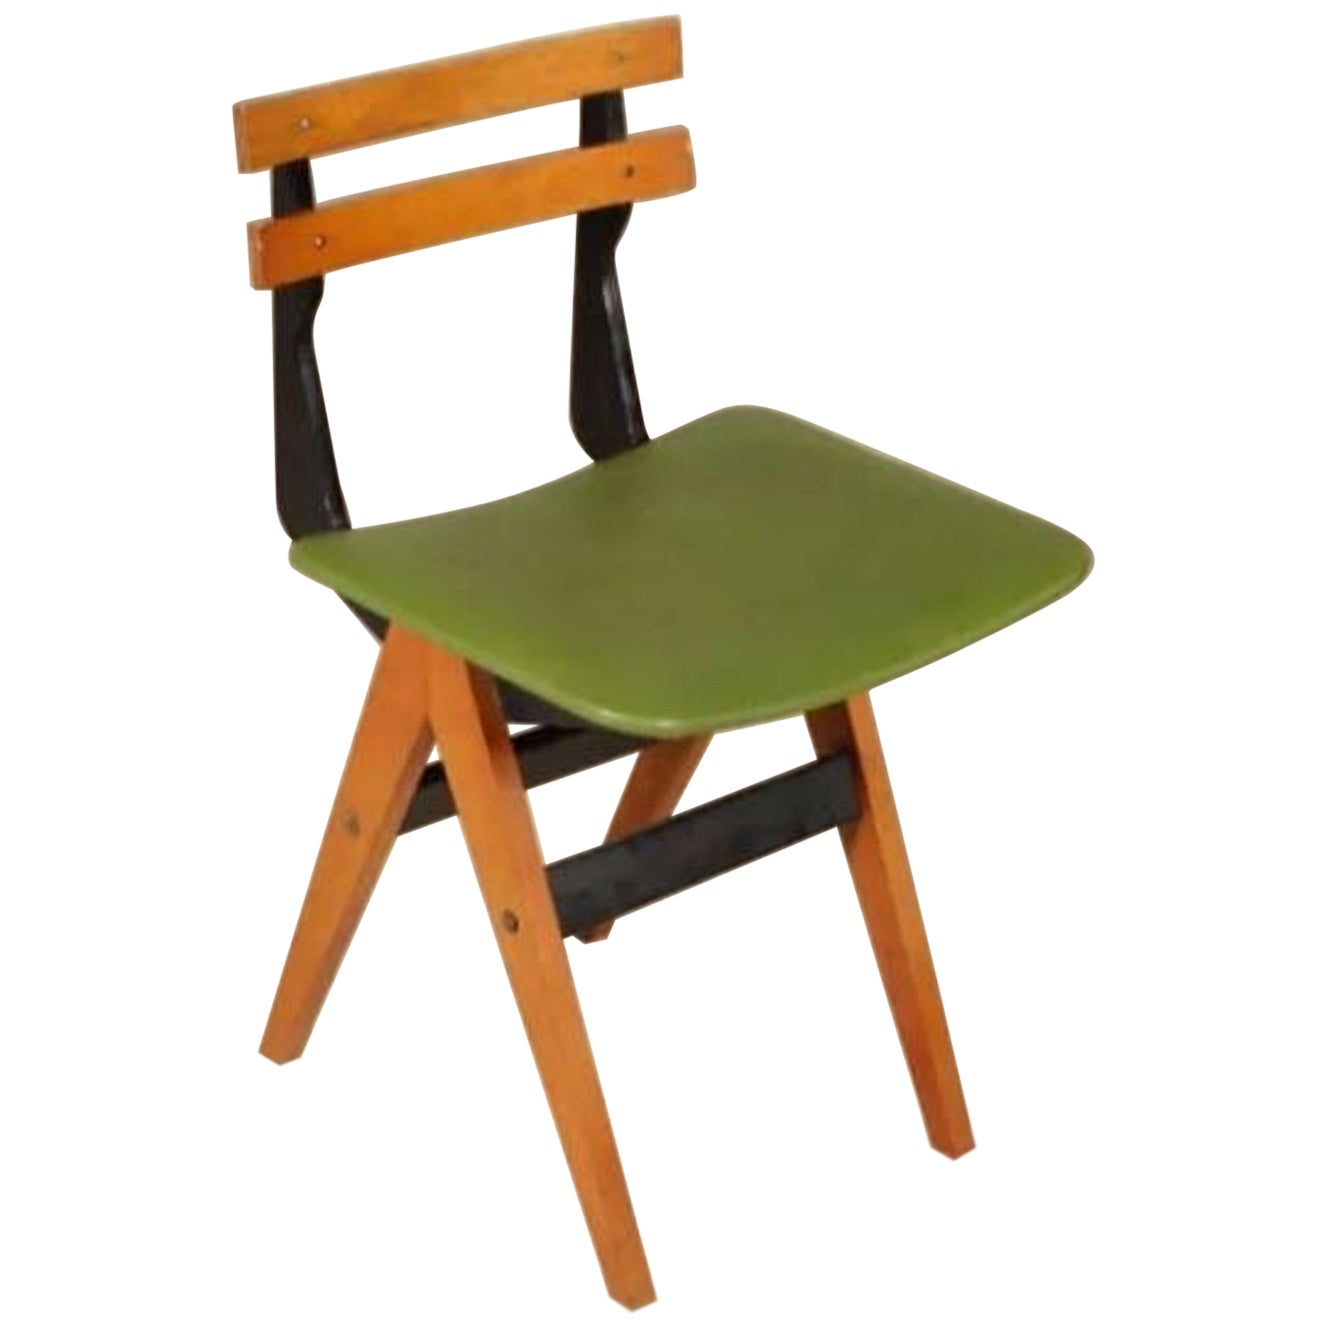 Ico & Luisa Parisi Rare Desk Chair, circa 1960, Italy